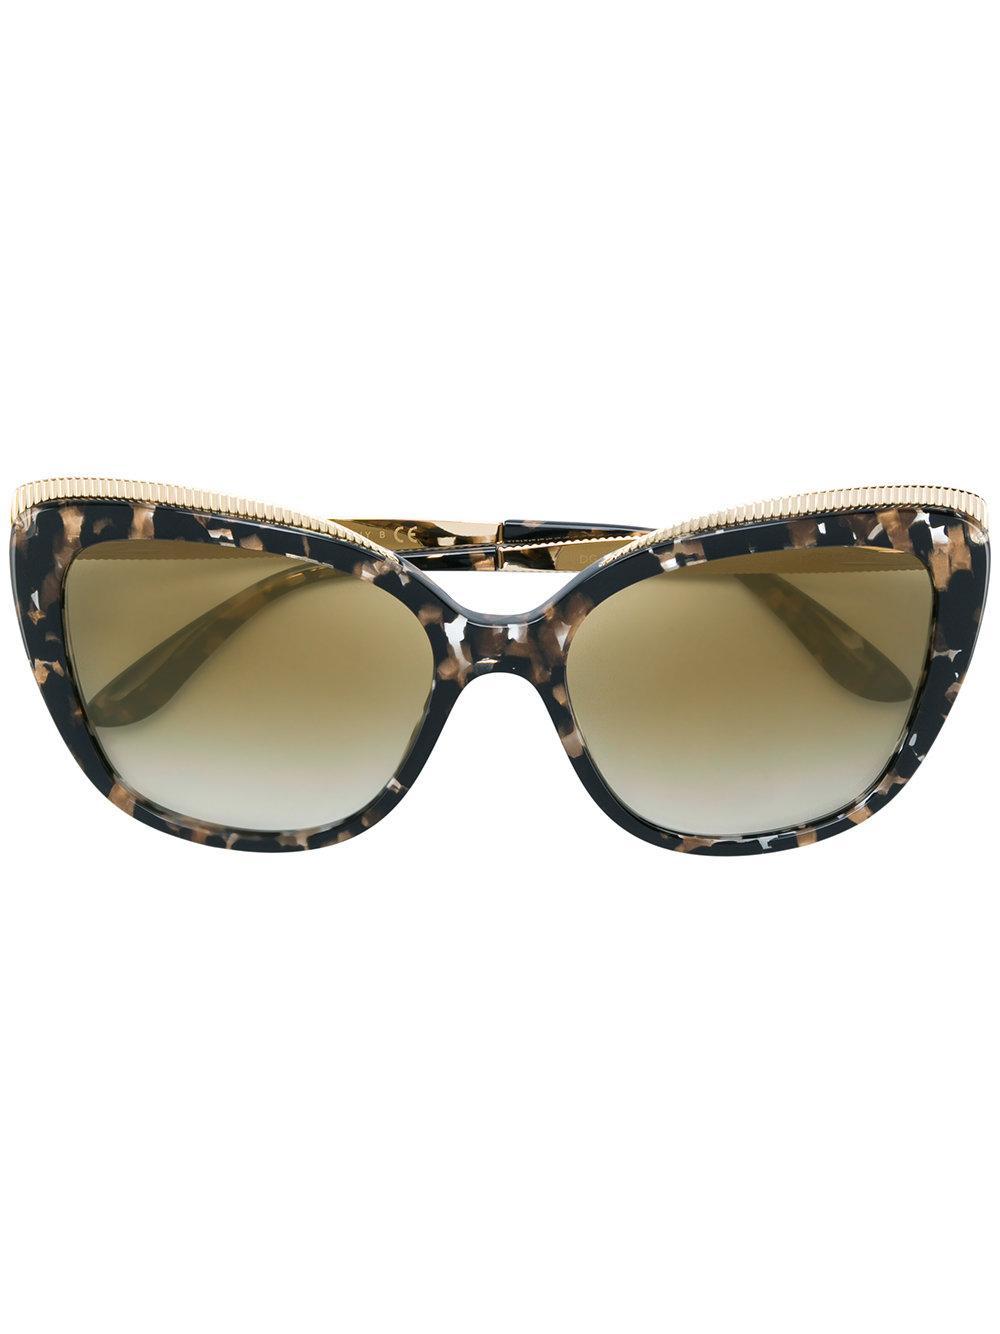 Dolce & Gabbana Cat Eye Sunglasses In Brown